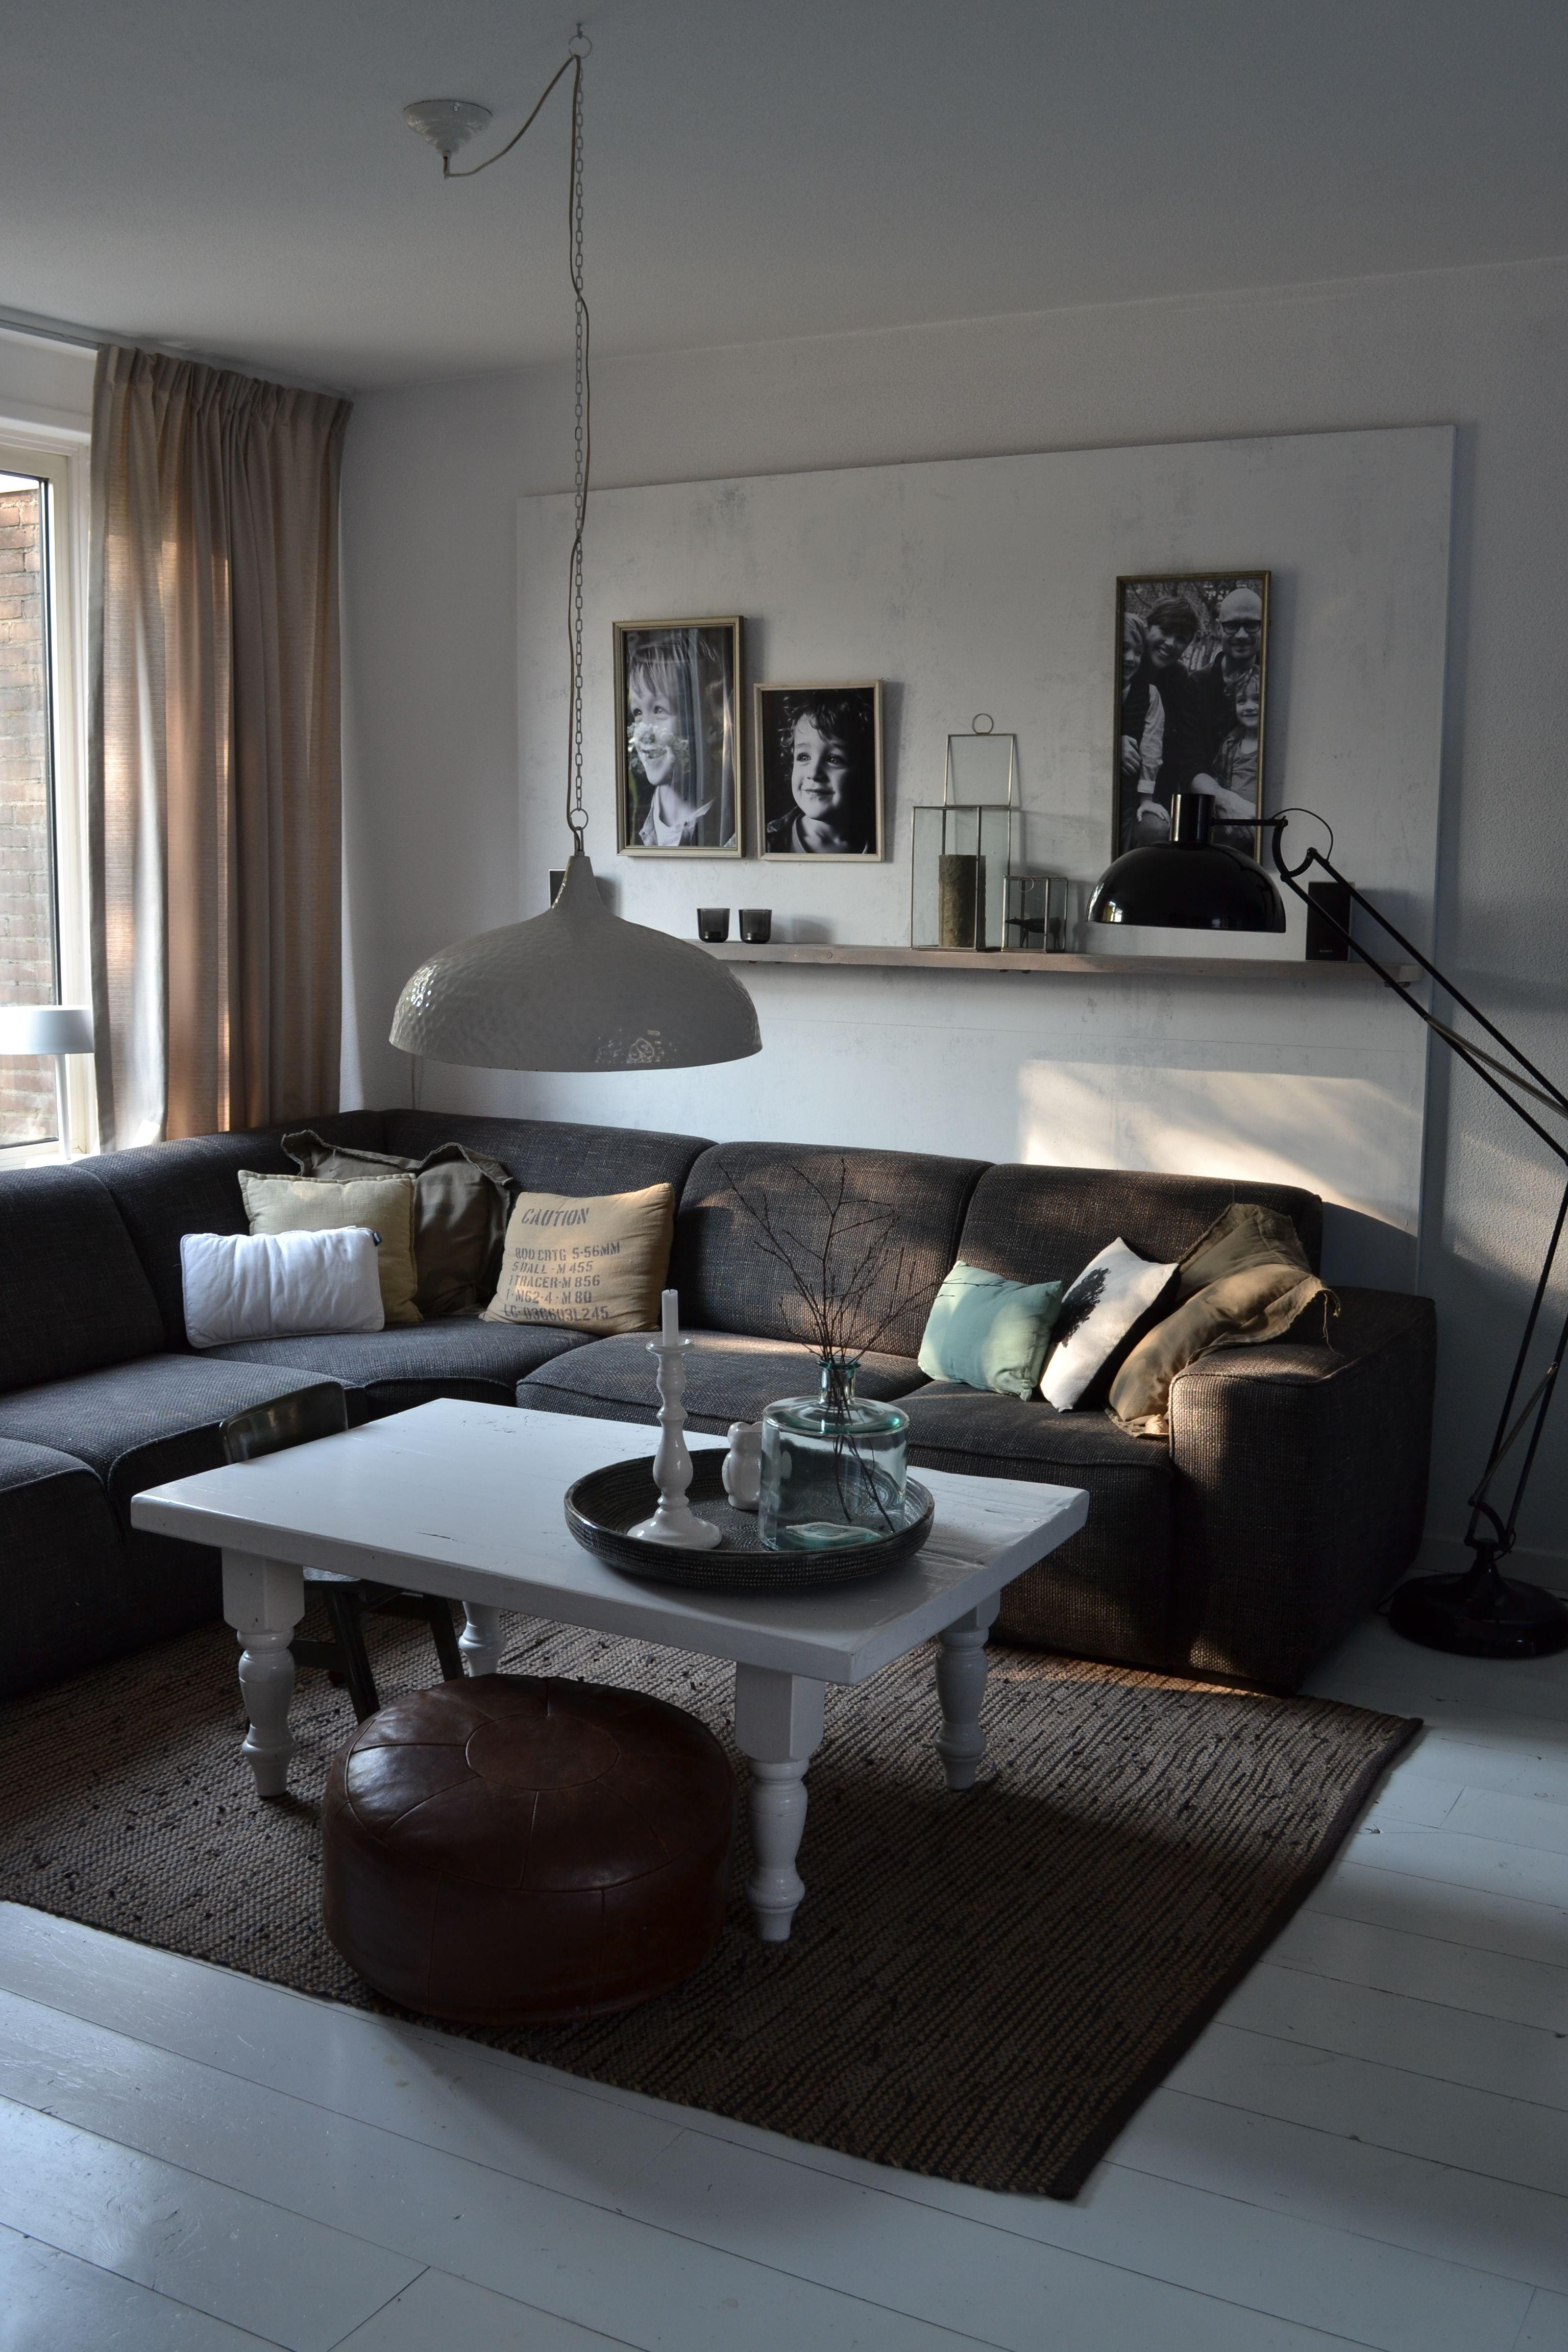 MANON interieur STYLING Foto bord achter bank woonkamer. Makkelijk ...